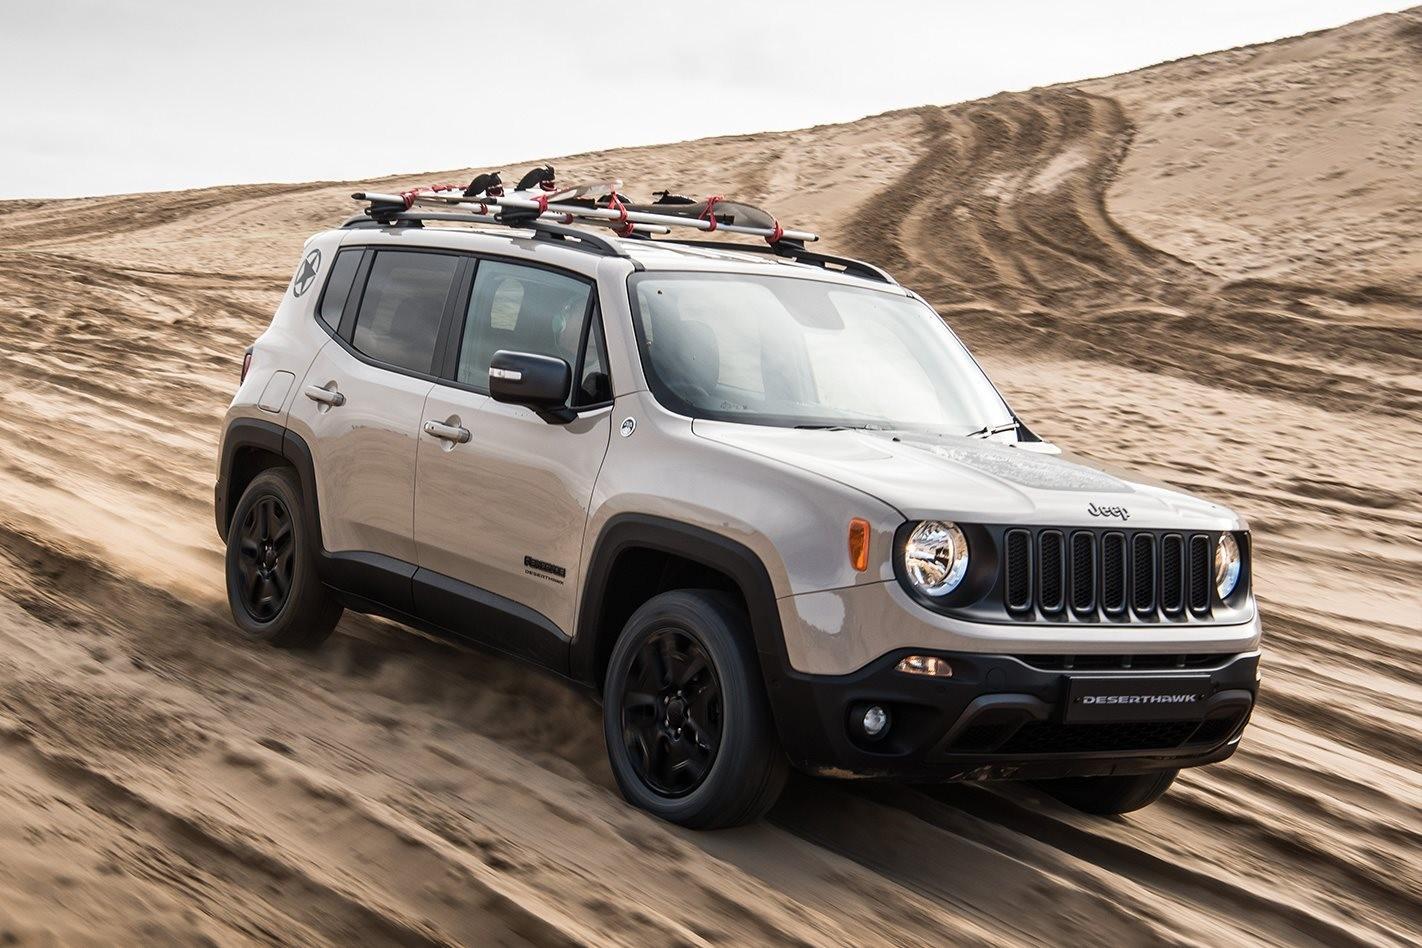 2017 Jeep Renegade Desert Hawk, Limited Edition